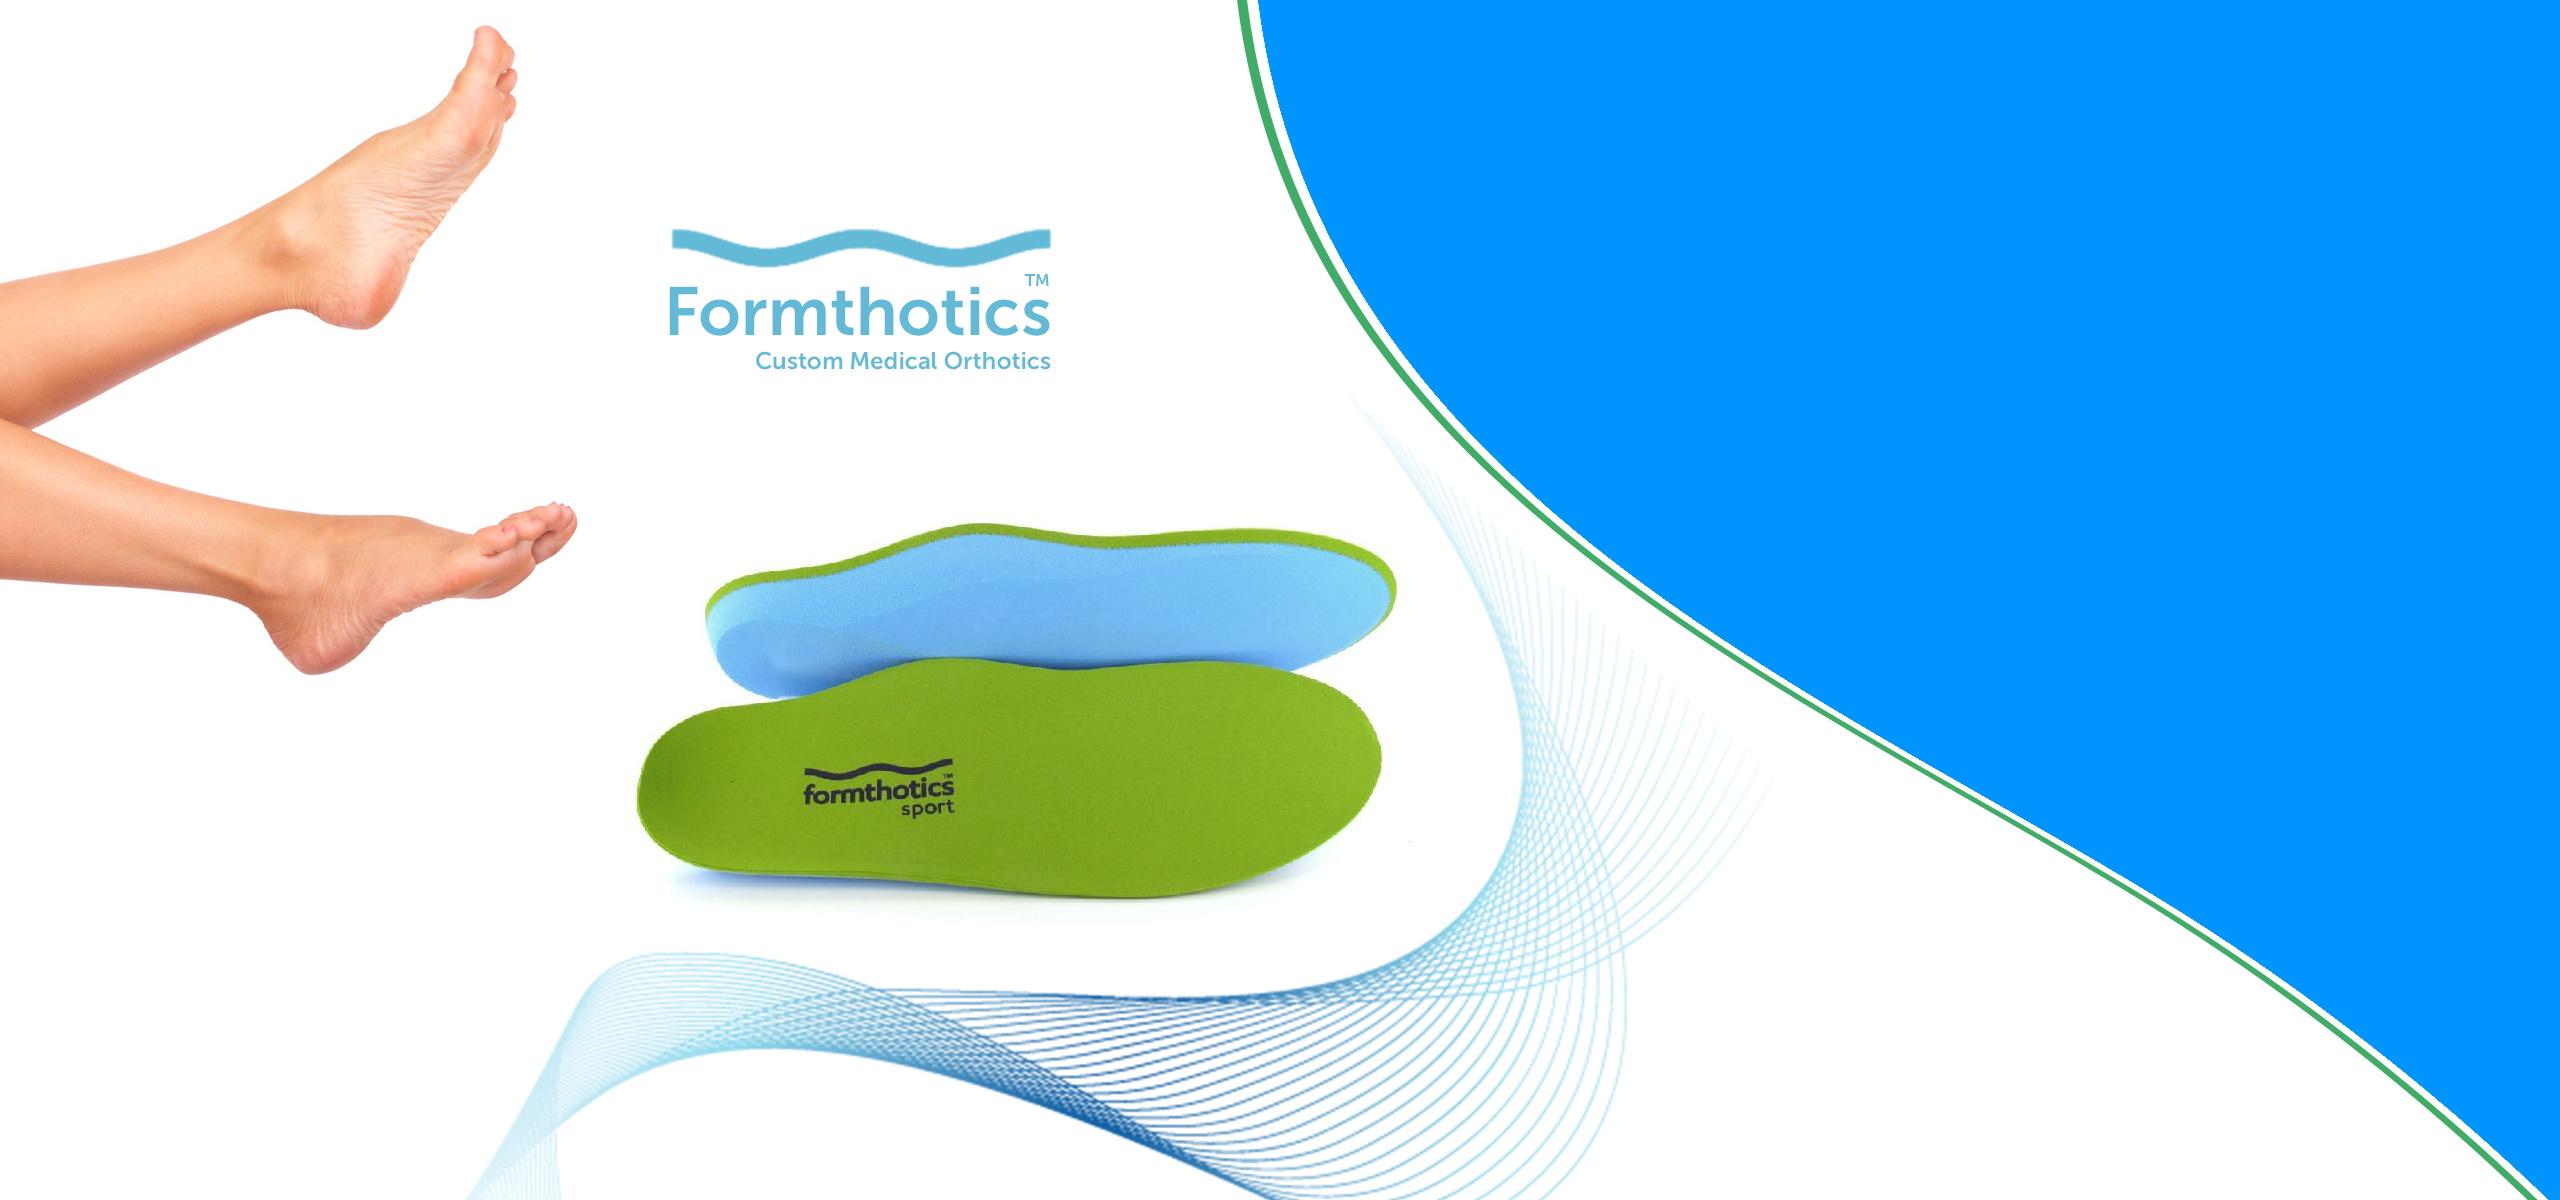 formthotics